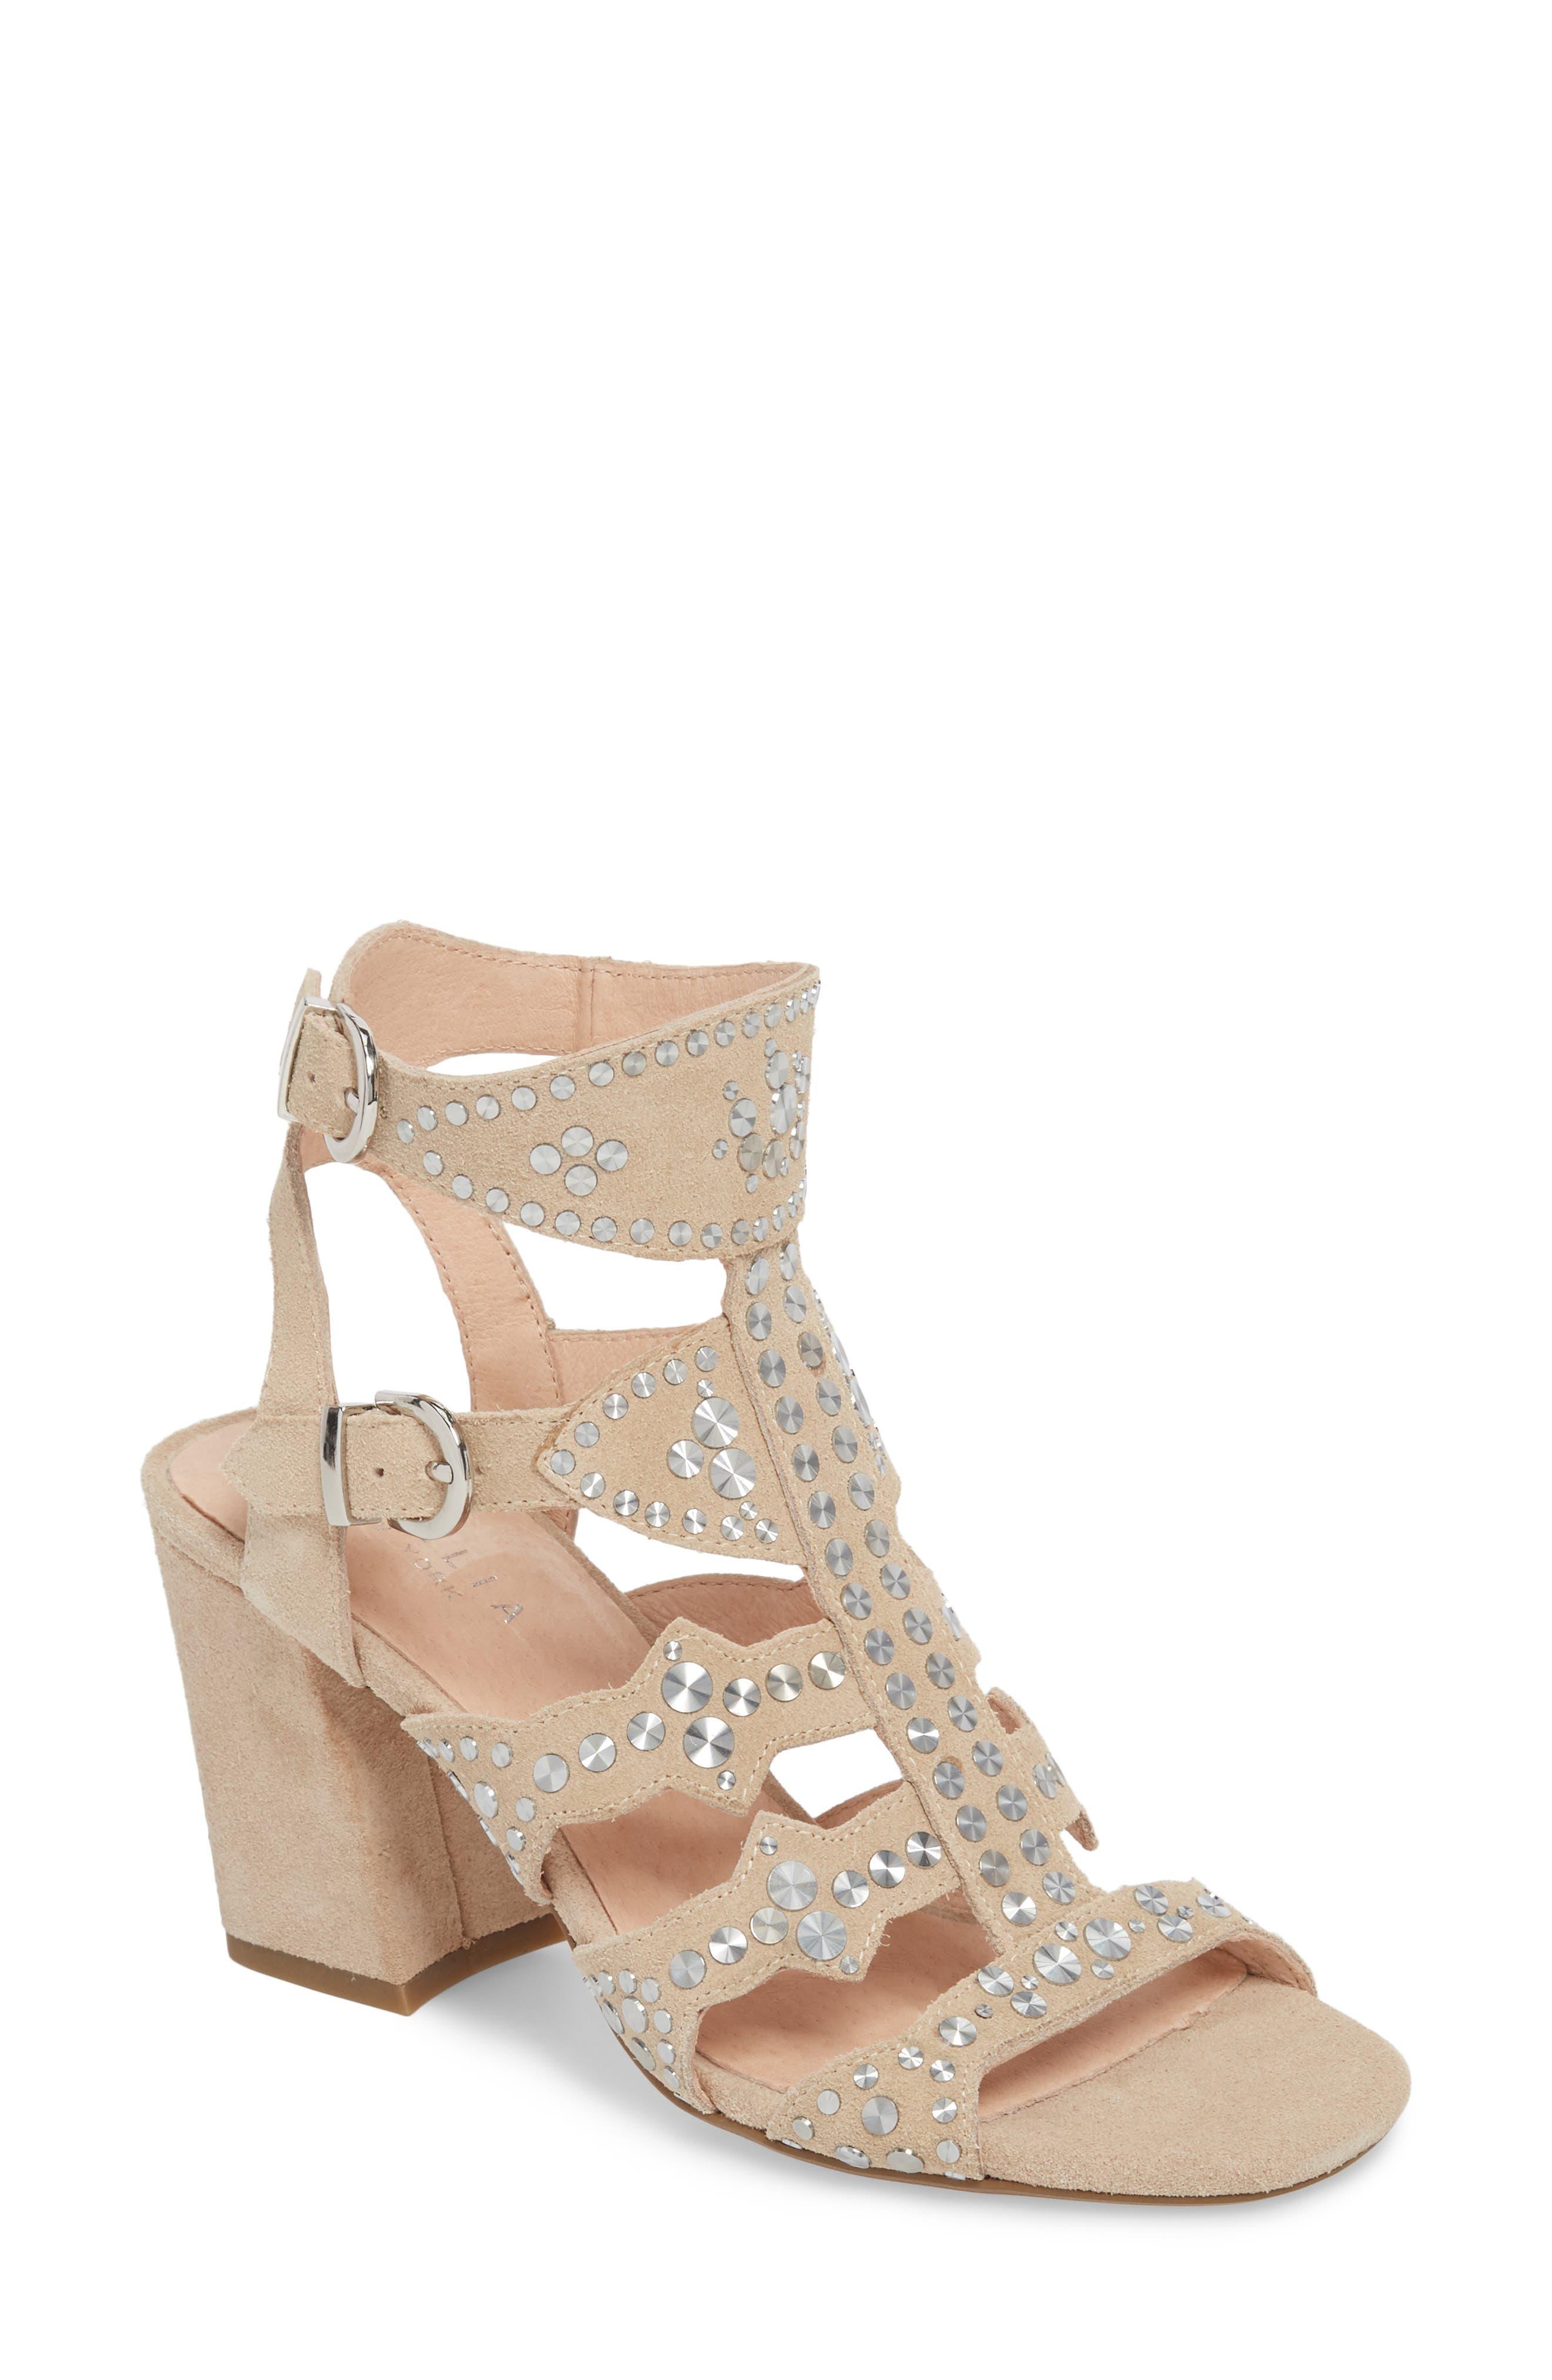 Cecelia New York Cosmo Studded Sandal (Women)